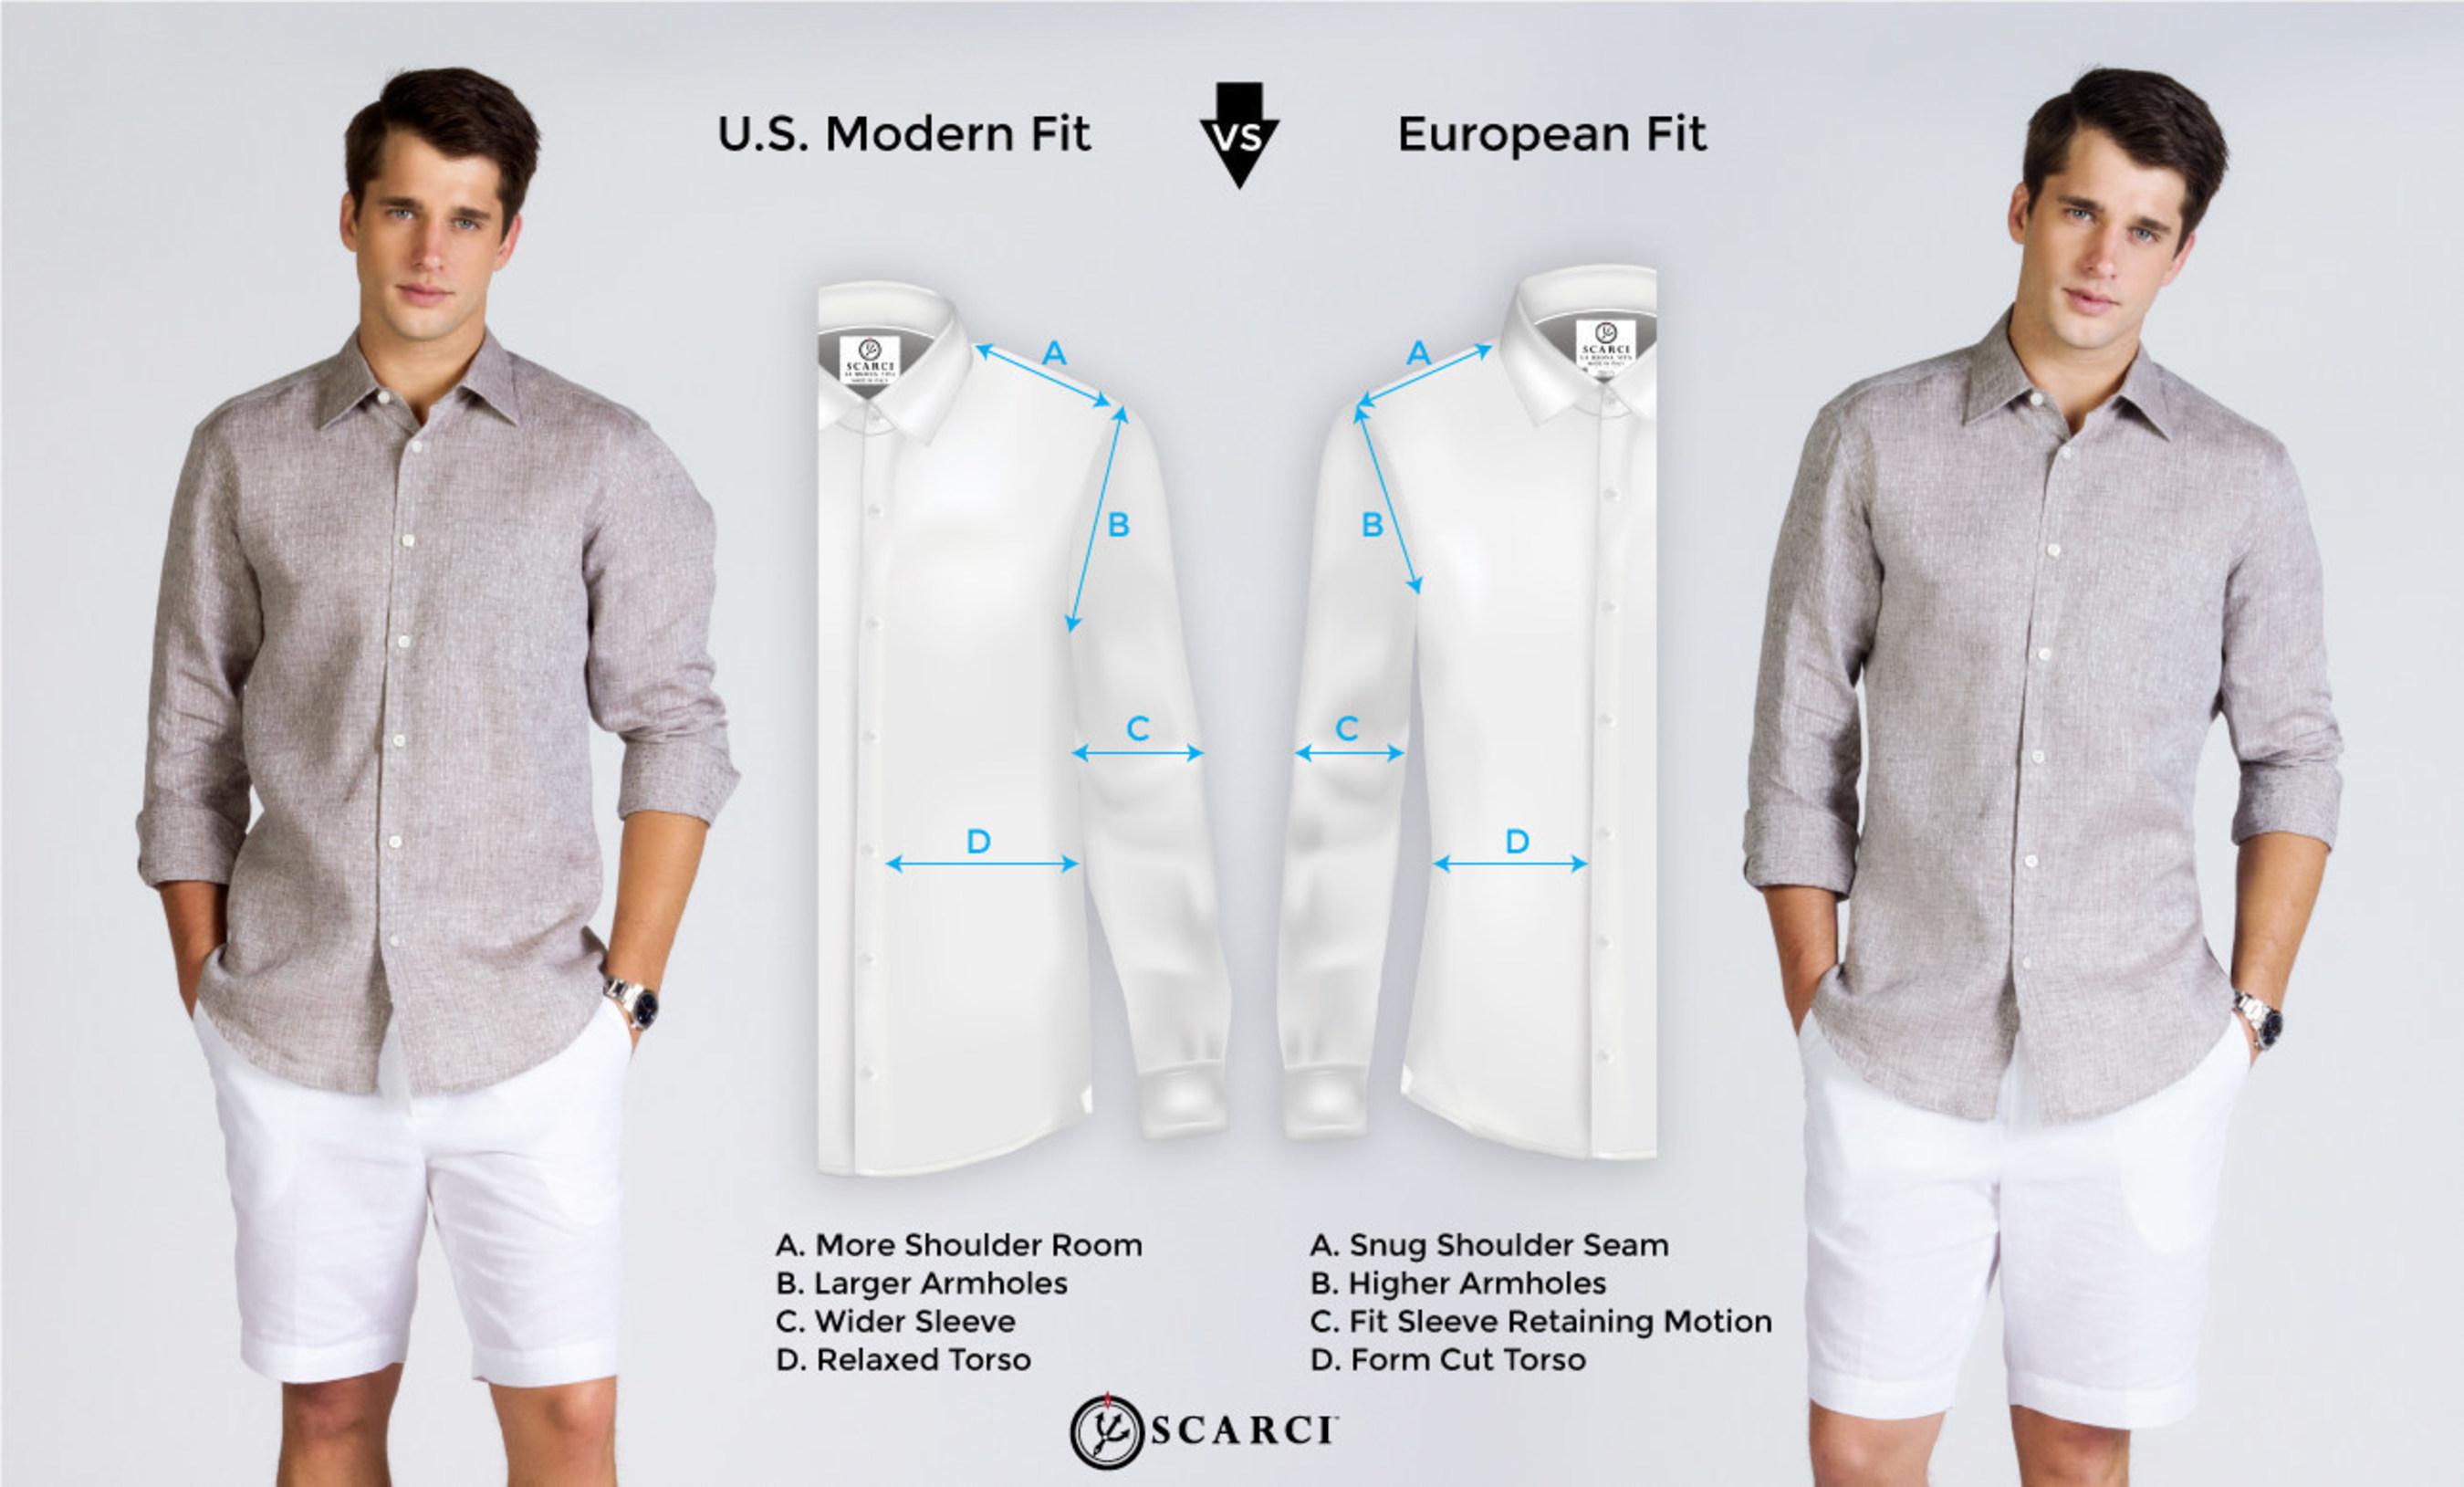 SCARCI Italian Resort Wear Launches Exclusive U.S. Tailored Line